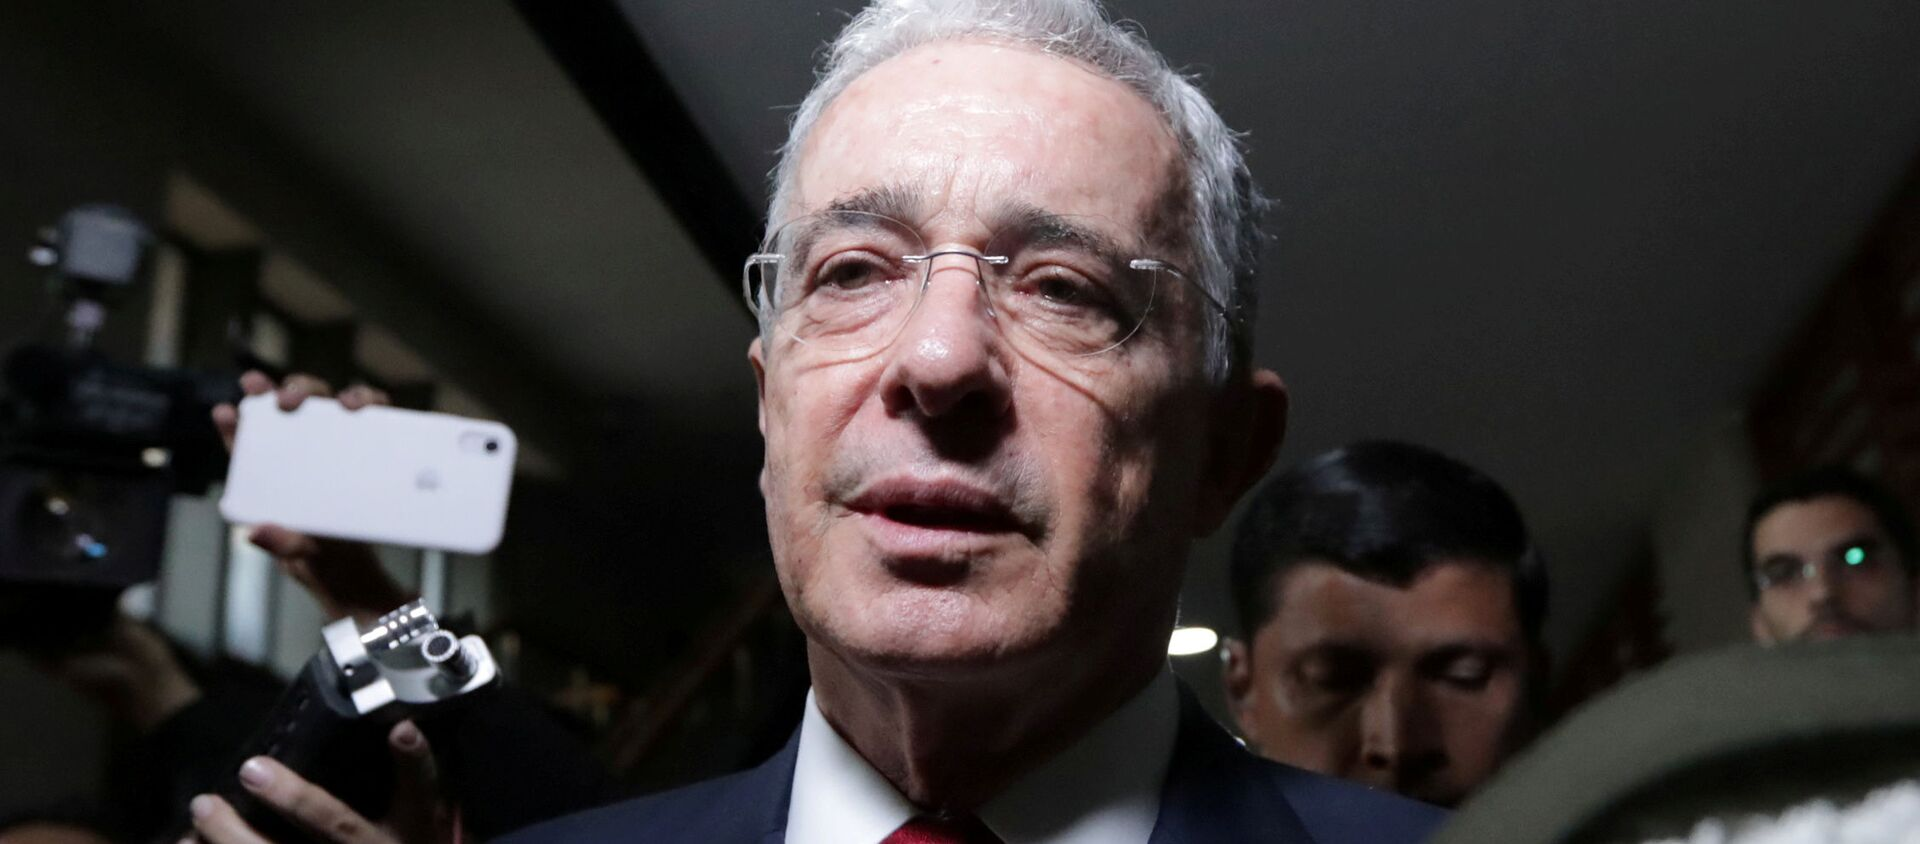 Álvaro Uribe, expresidente de Colombia - Sputnik Mundo, 1920, 31.08.2020